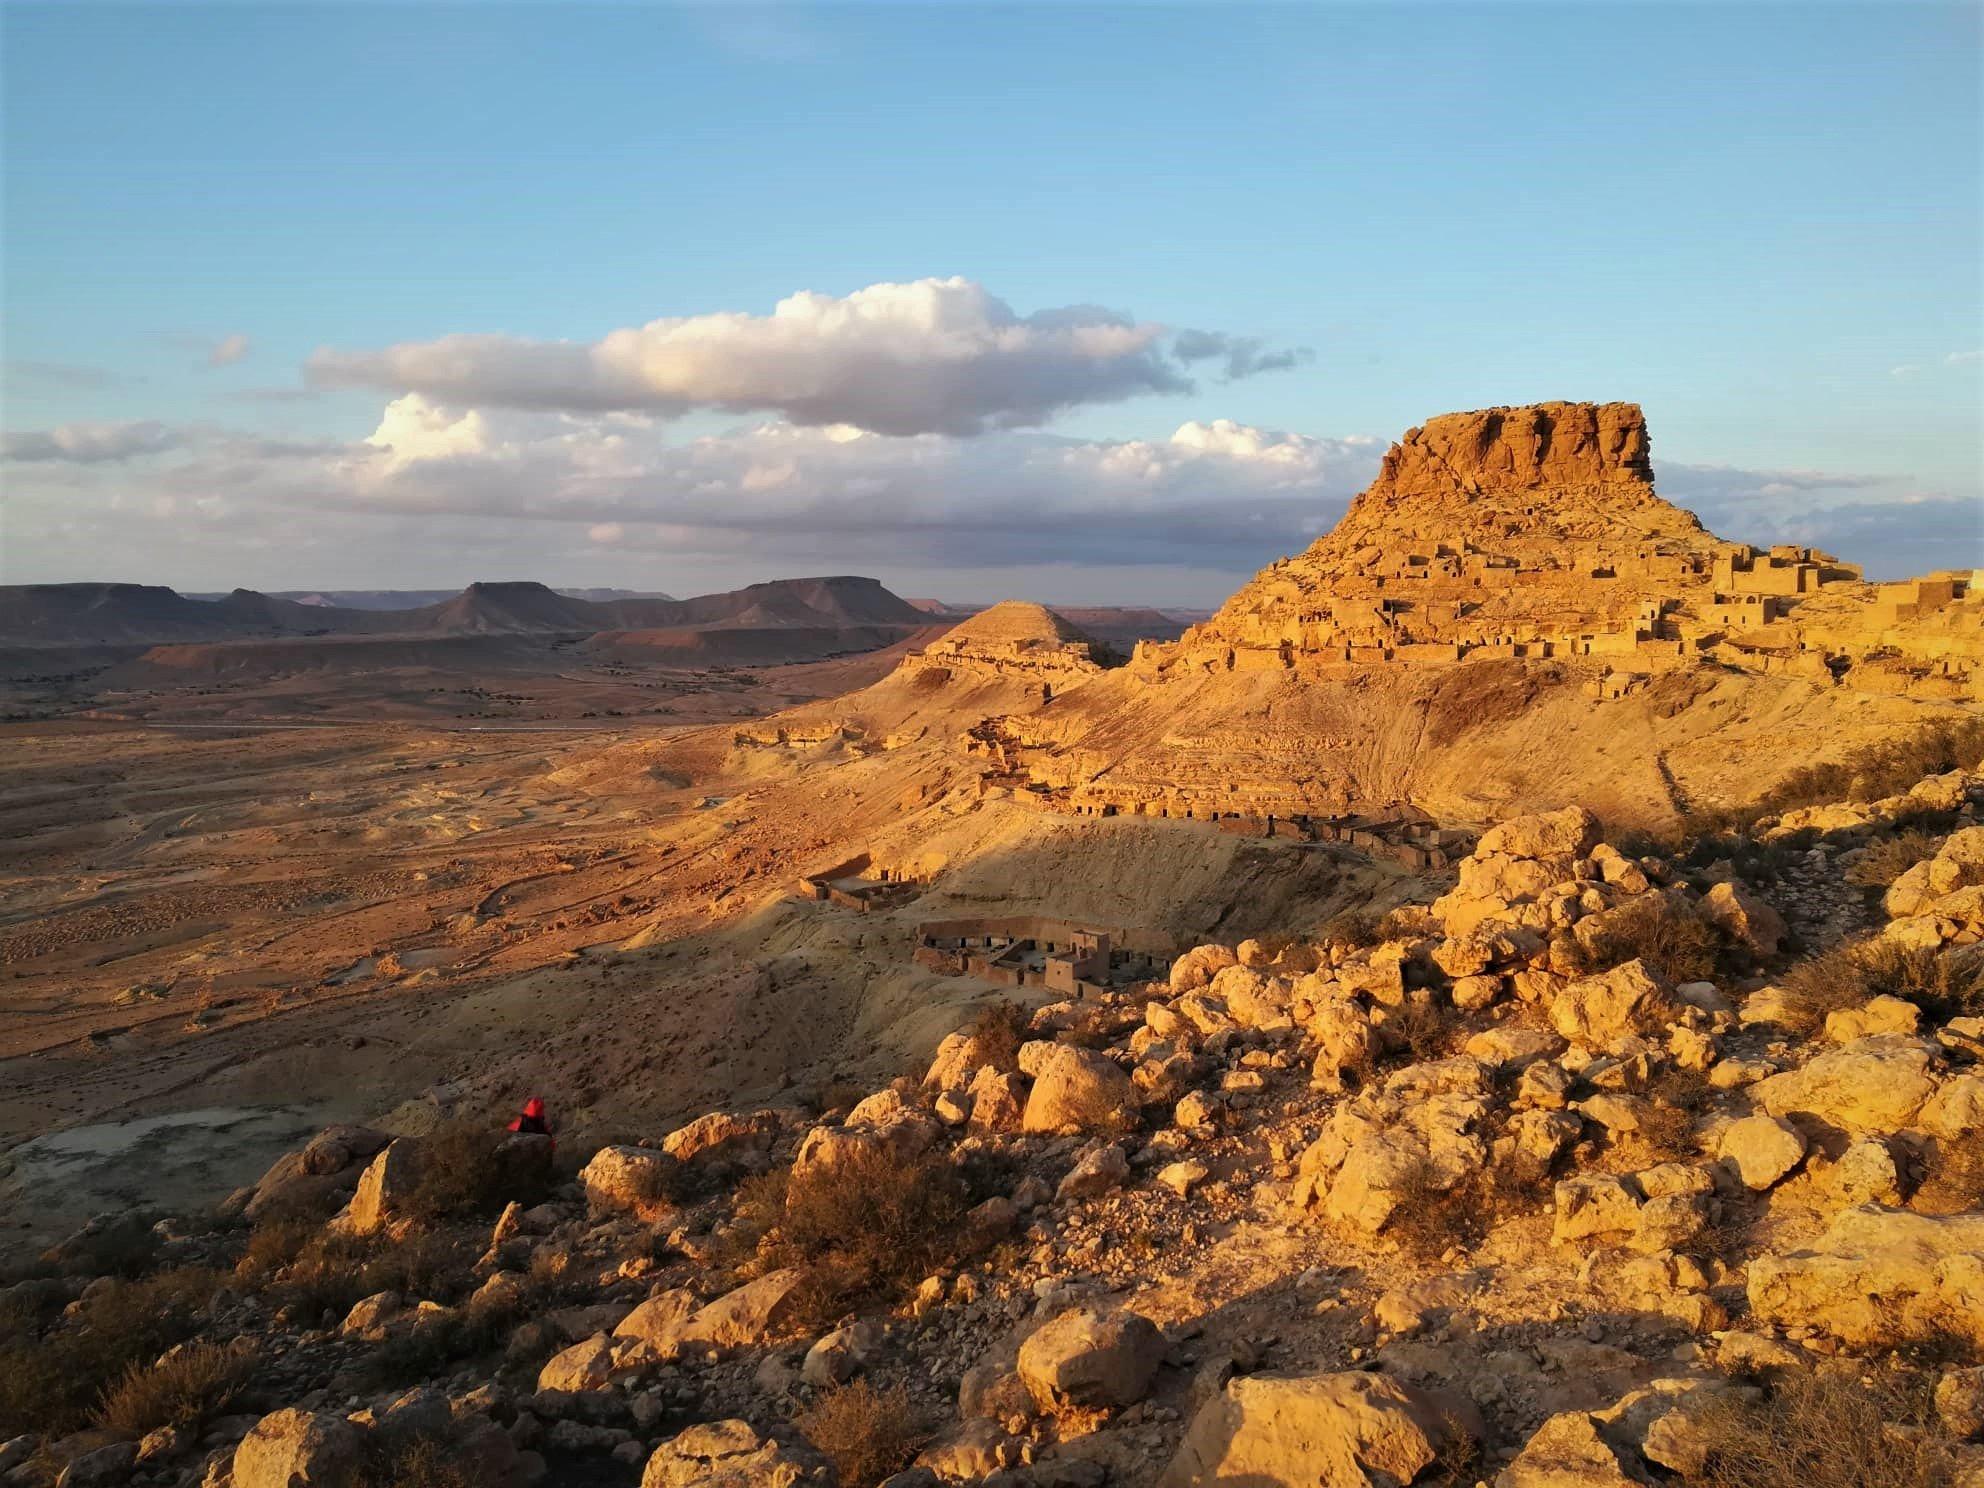 viaggio-trekking-tunisia-paesaggio